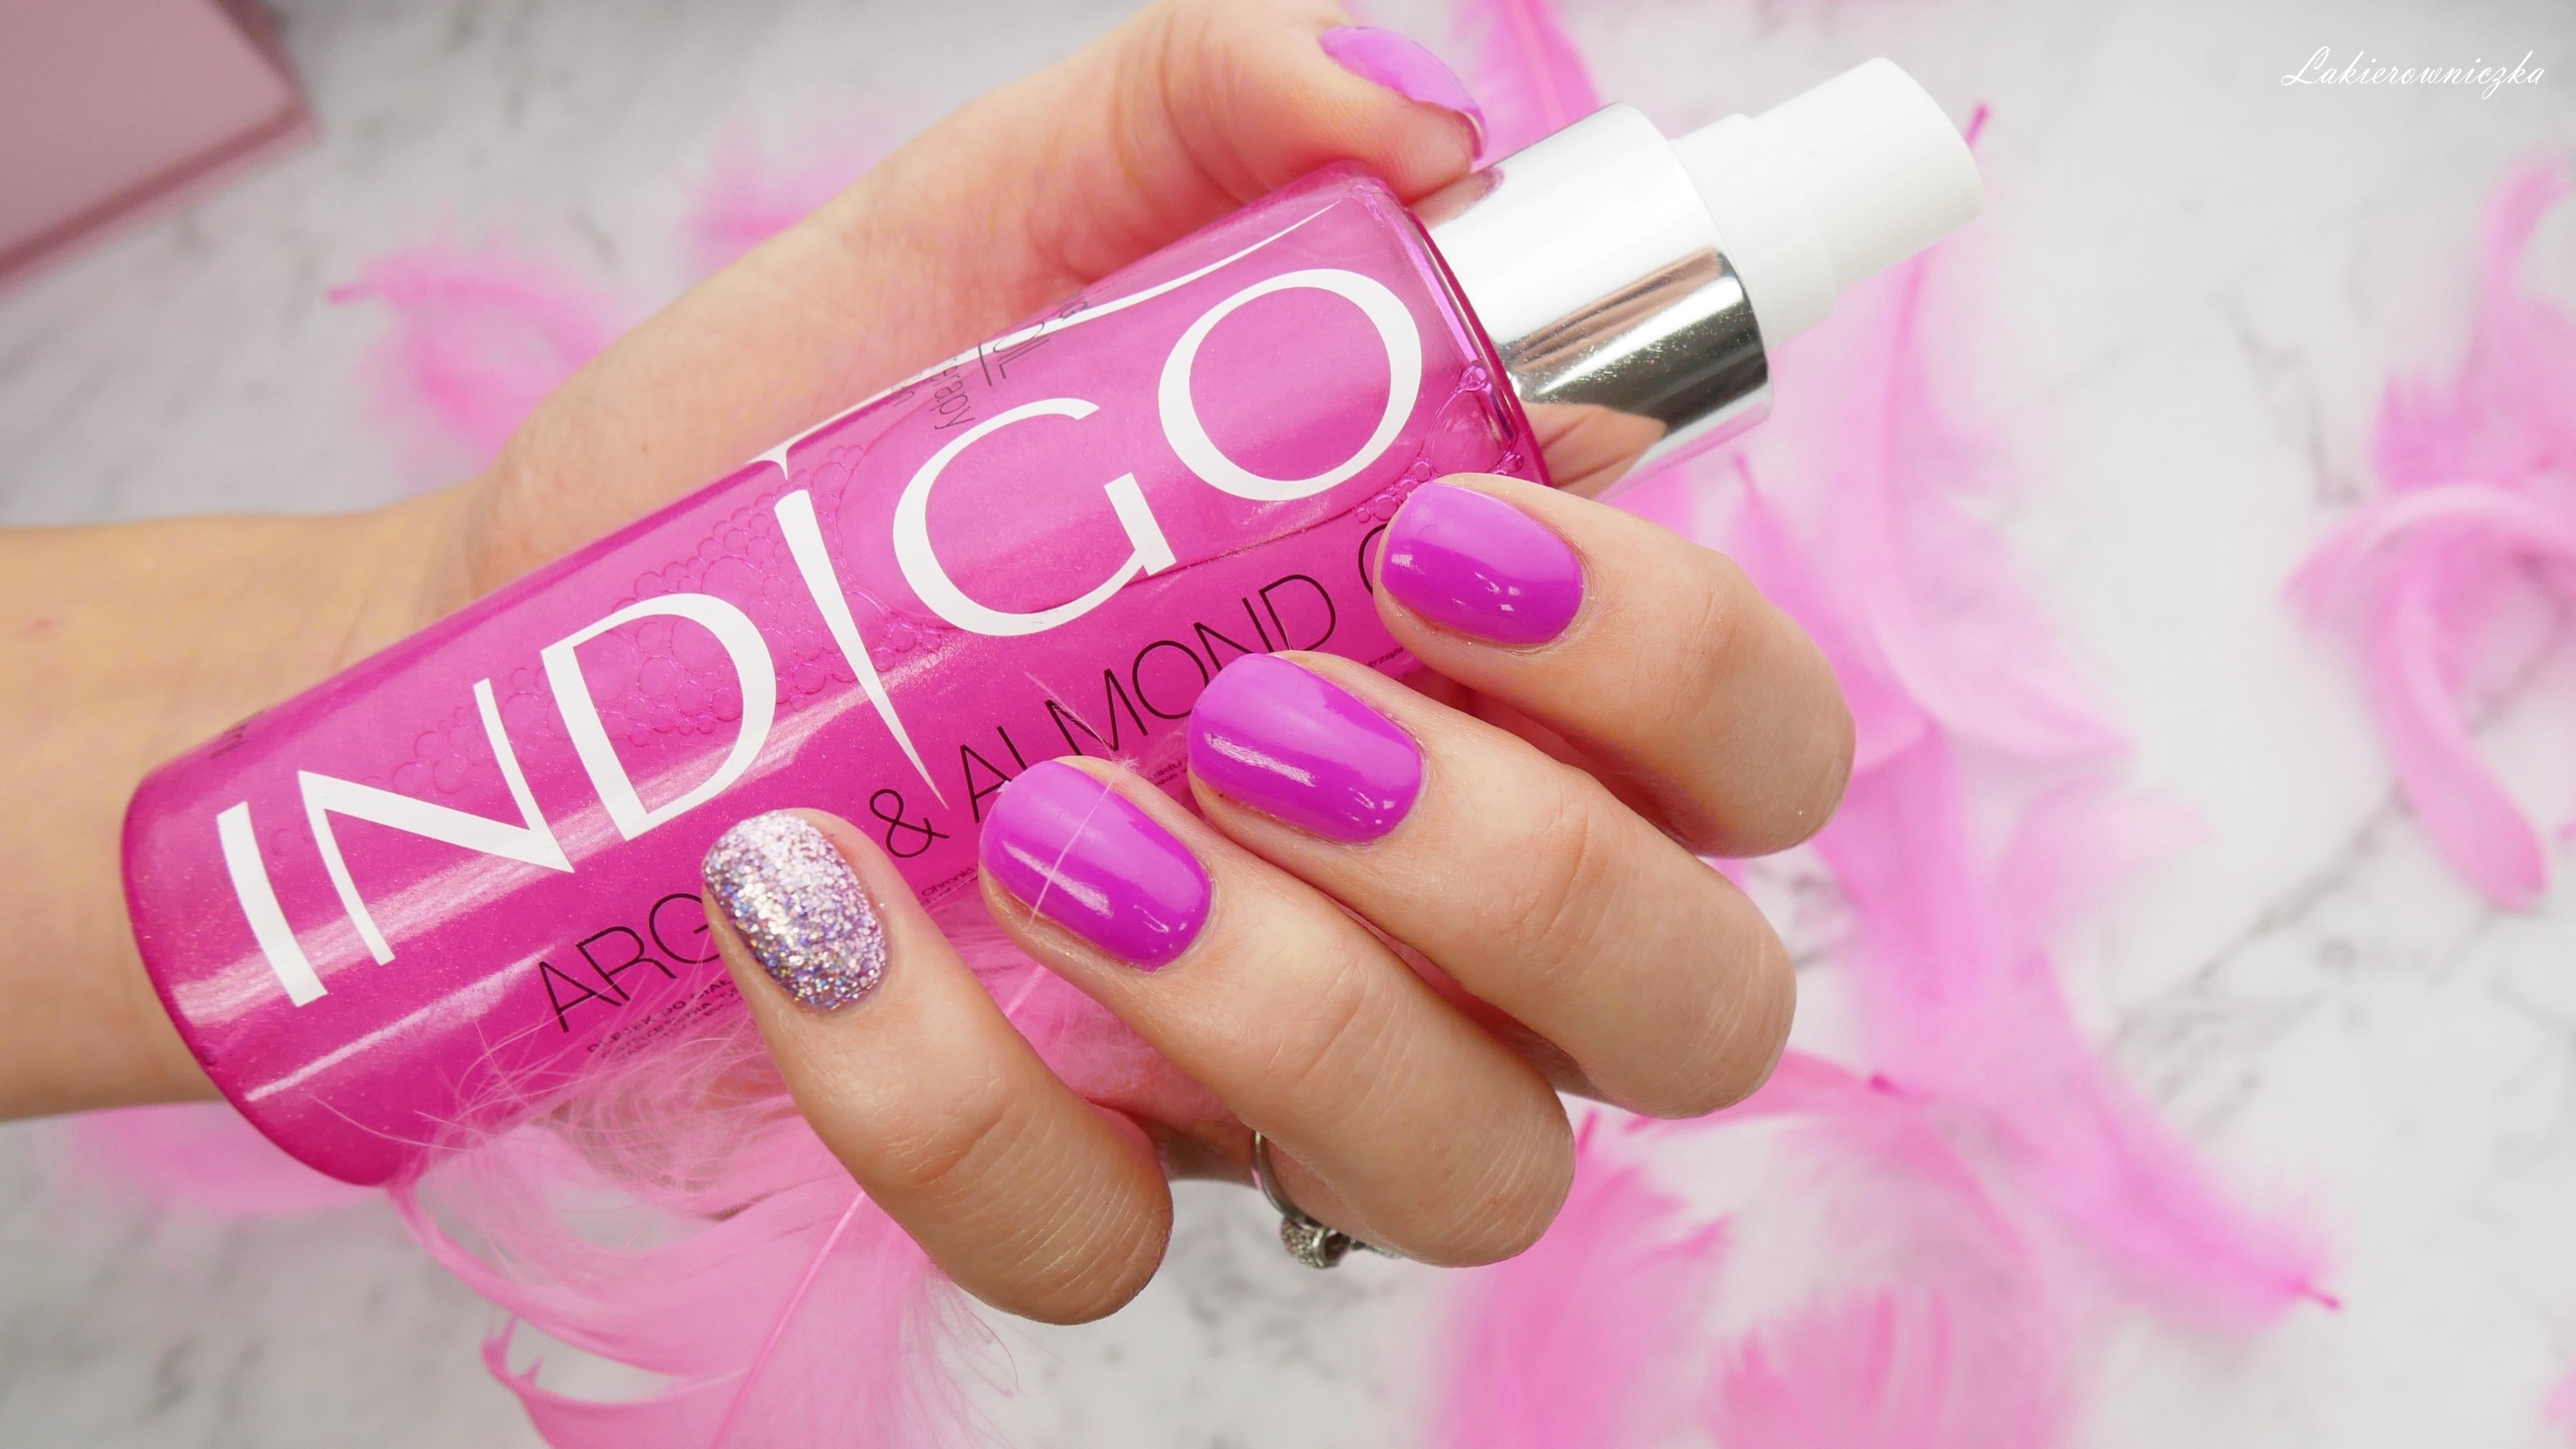 Indigo-olejek-arganowy-bling-blingbling-indigonails-olejekarganowy-Victoria-vynn-219-orchid-purple-223-rose-diamond-carat-Lakierowniczka-Indigo olejek arganowy Bling bling